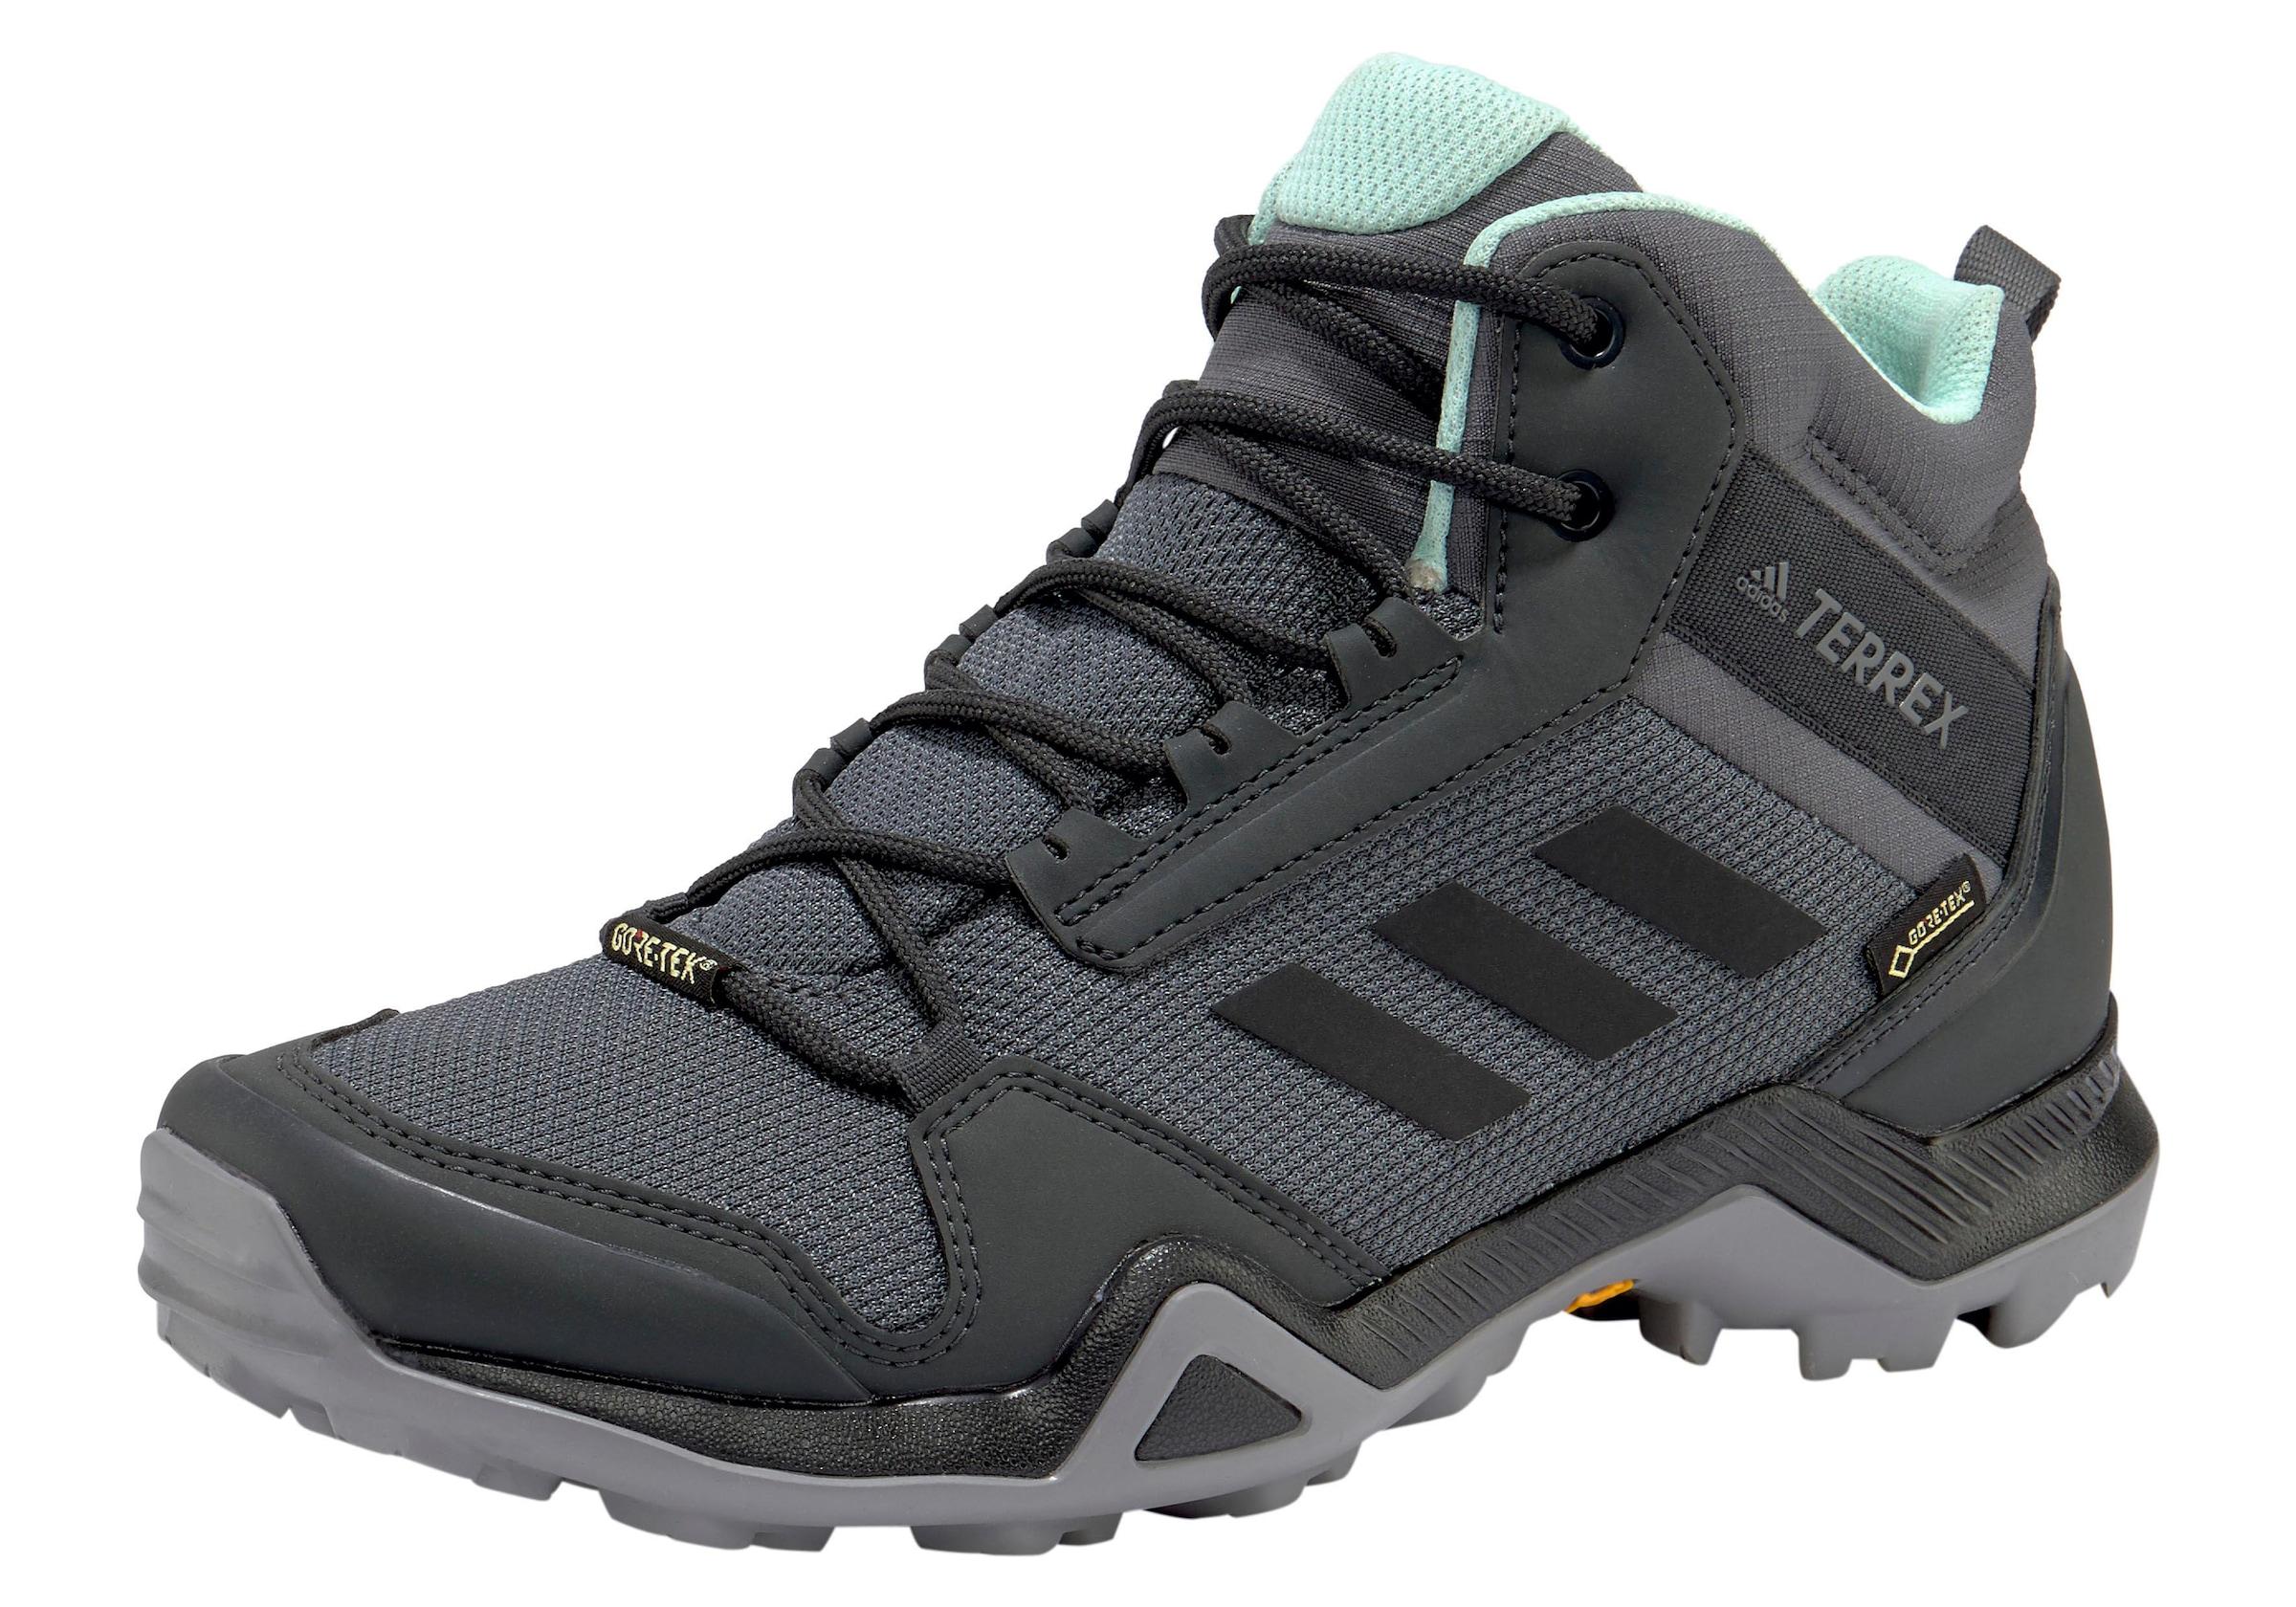 Mid Adidas »terrex Performance Ax3 Goretex« Outdoorschuh KaufenBaur hCsdxQrt